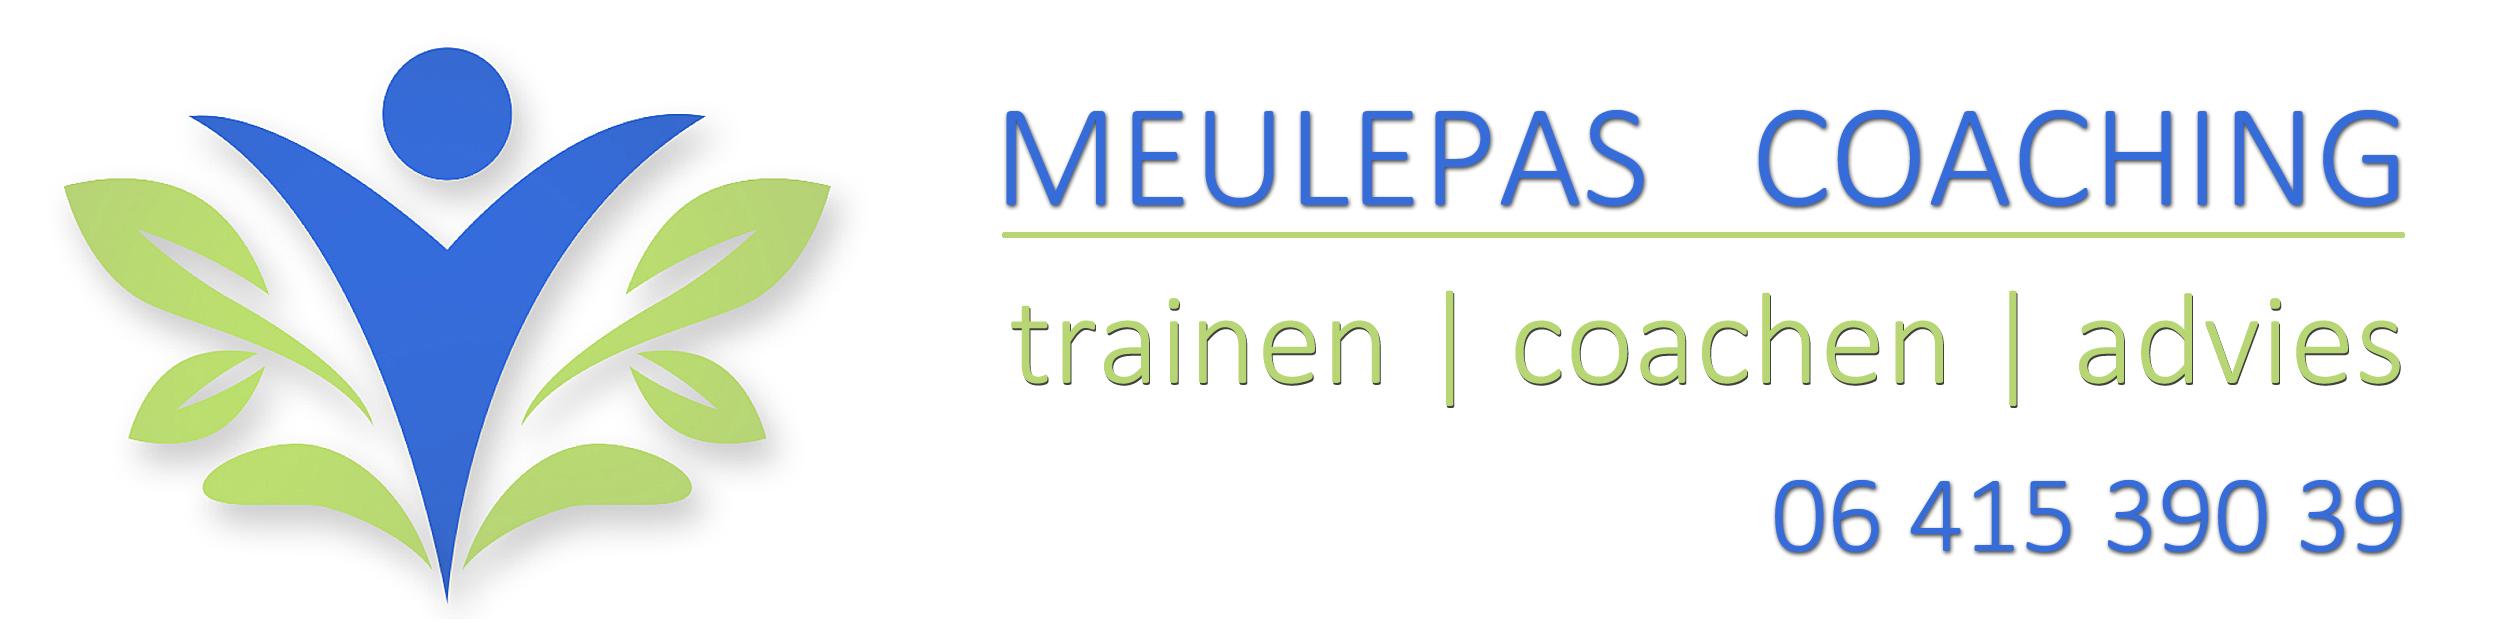 MEULEPAS COACHING